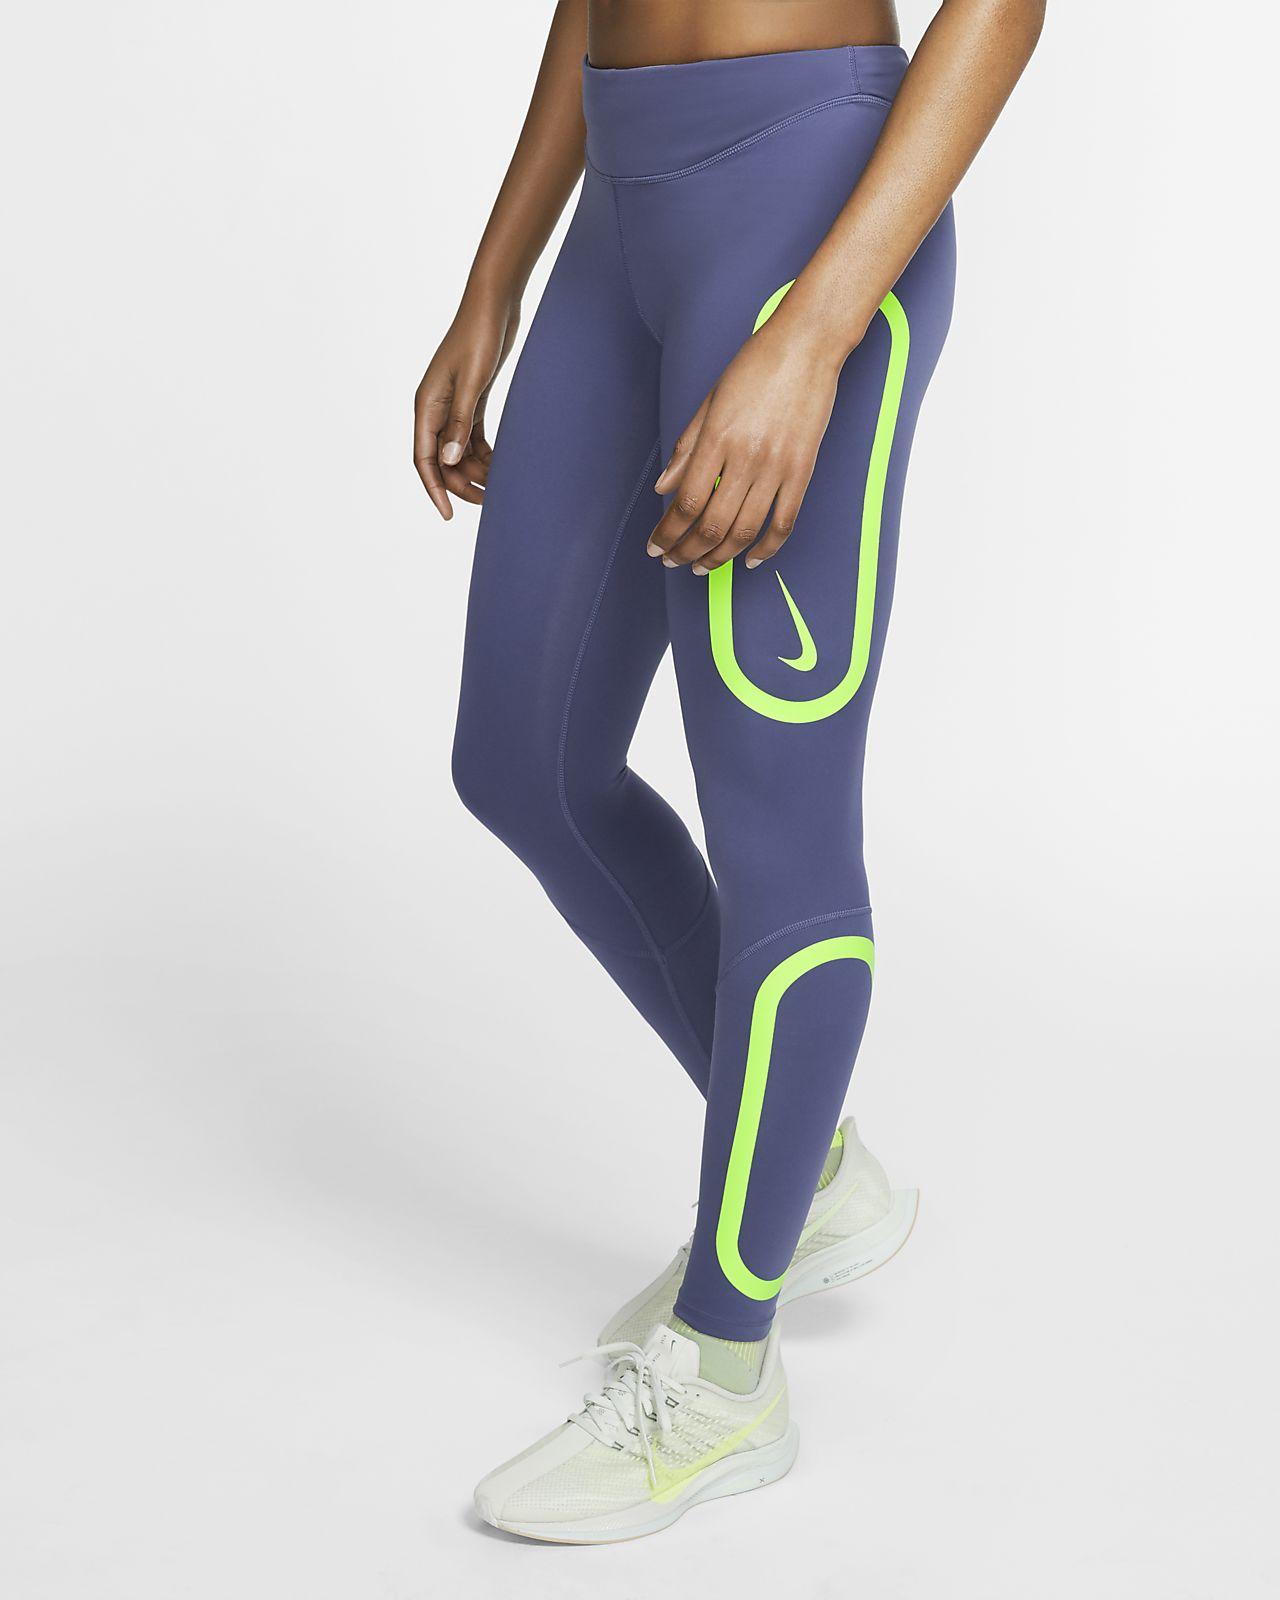 Nike Epic Lux Damen-Lauftights mit Grafik